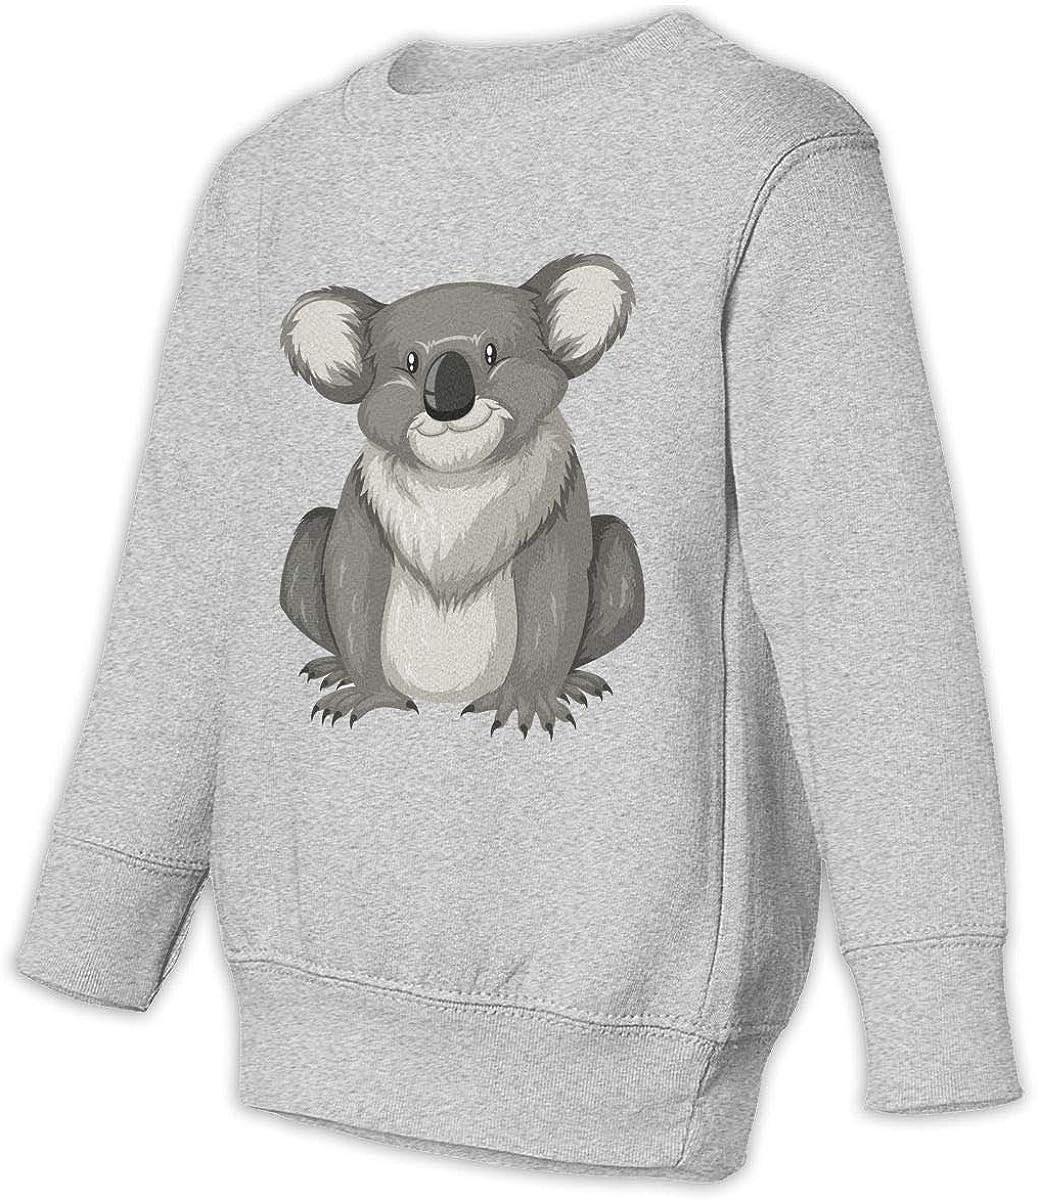 Cartoon Koala Unisex Toddler Hoodies Fleece Pull Over Sweatshirt for Boys Girls Kids Youth